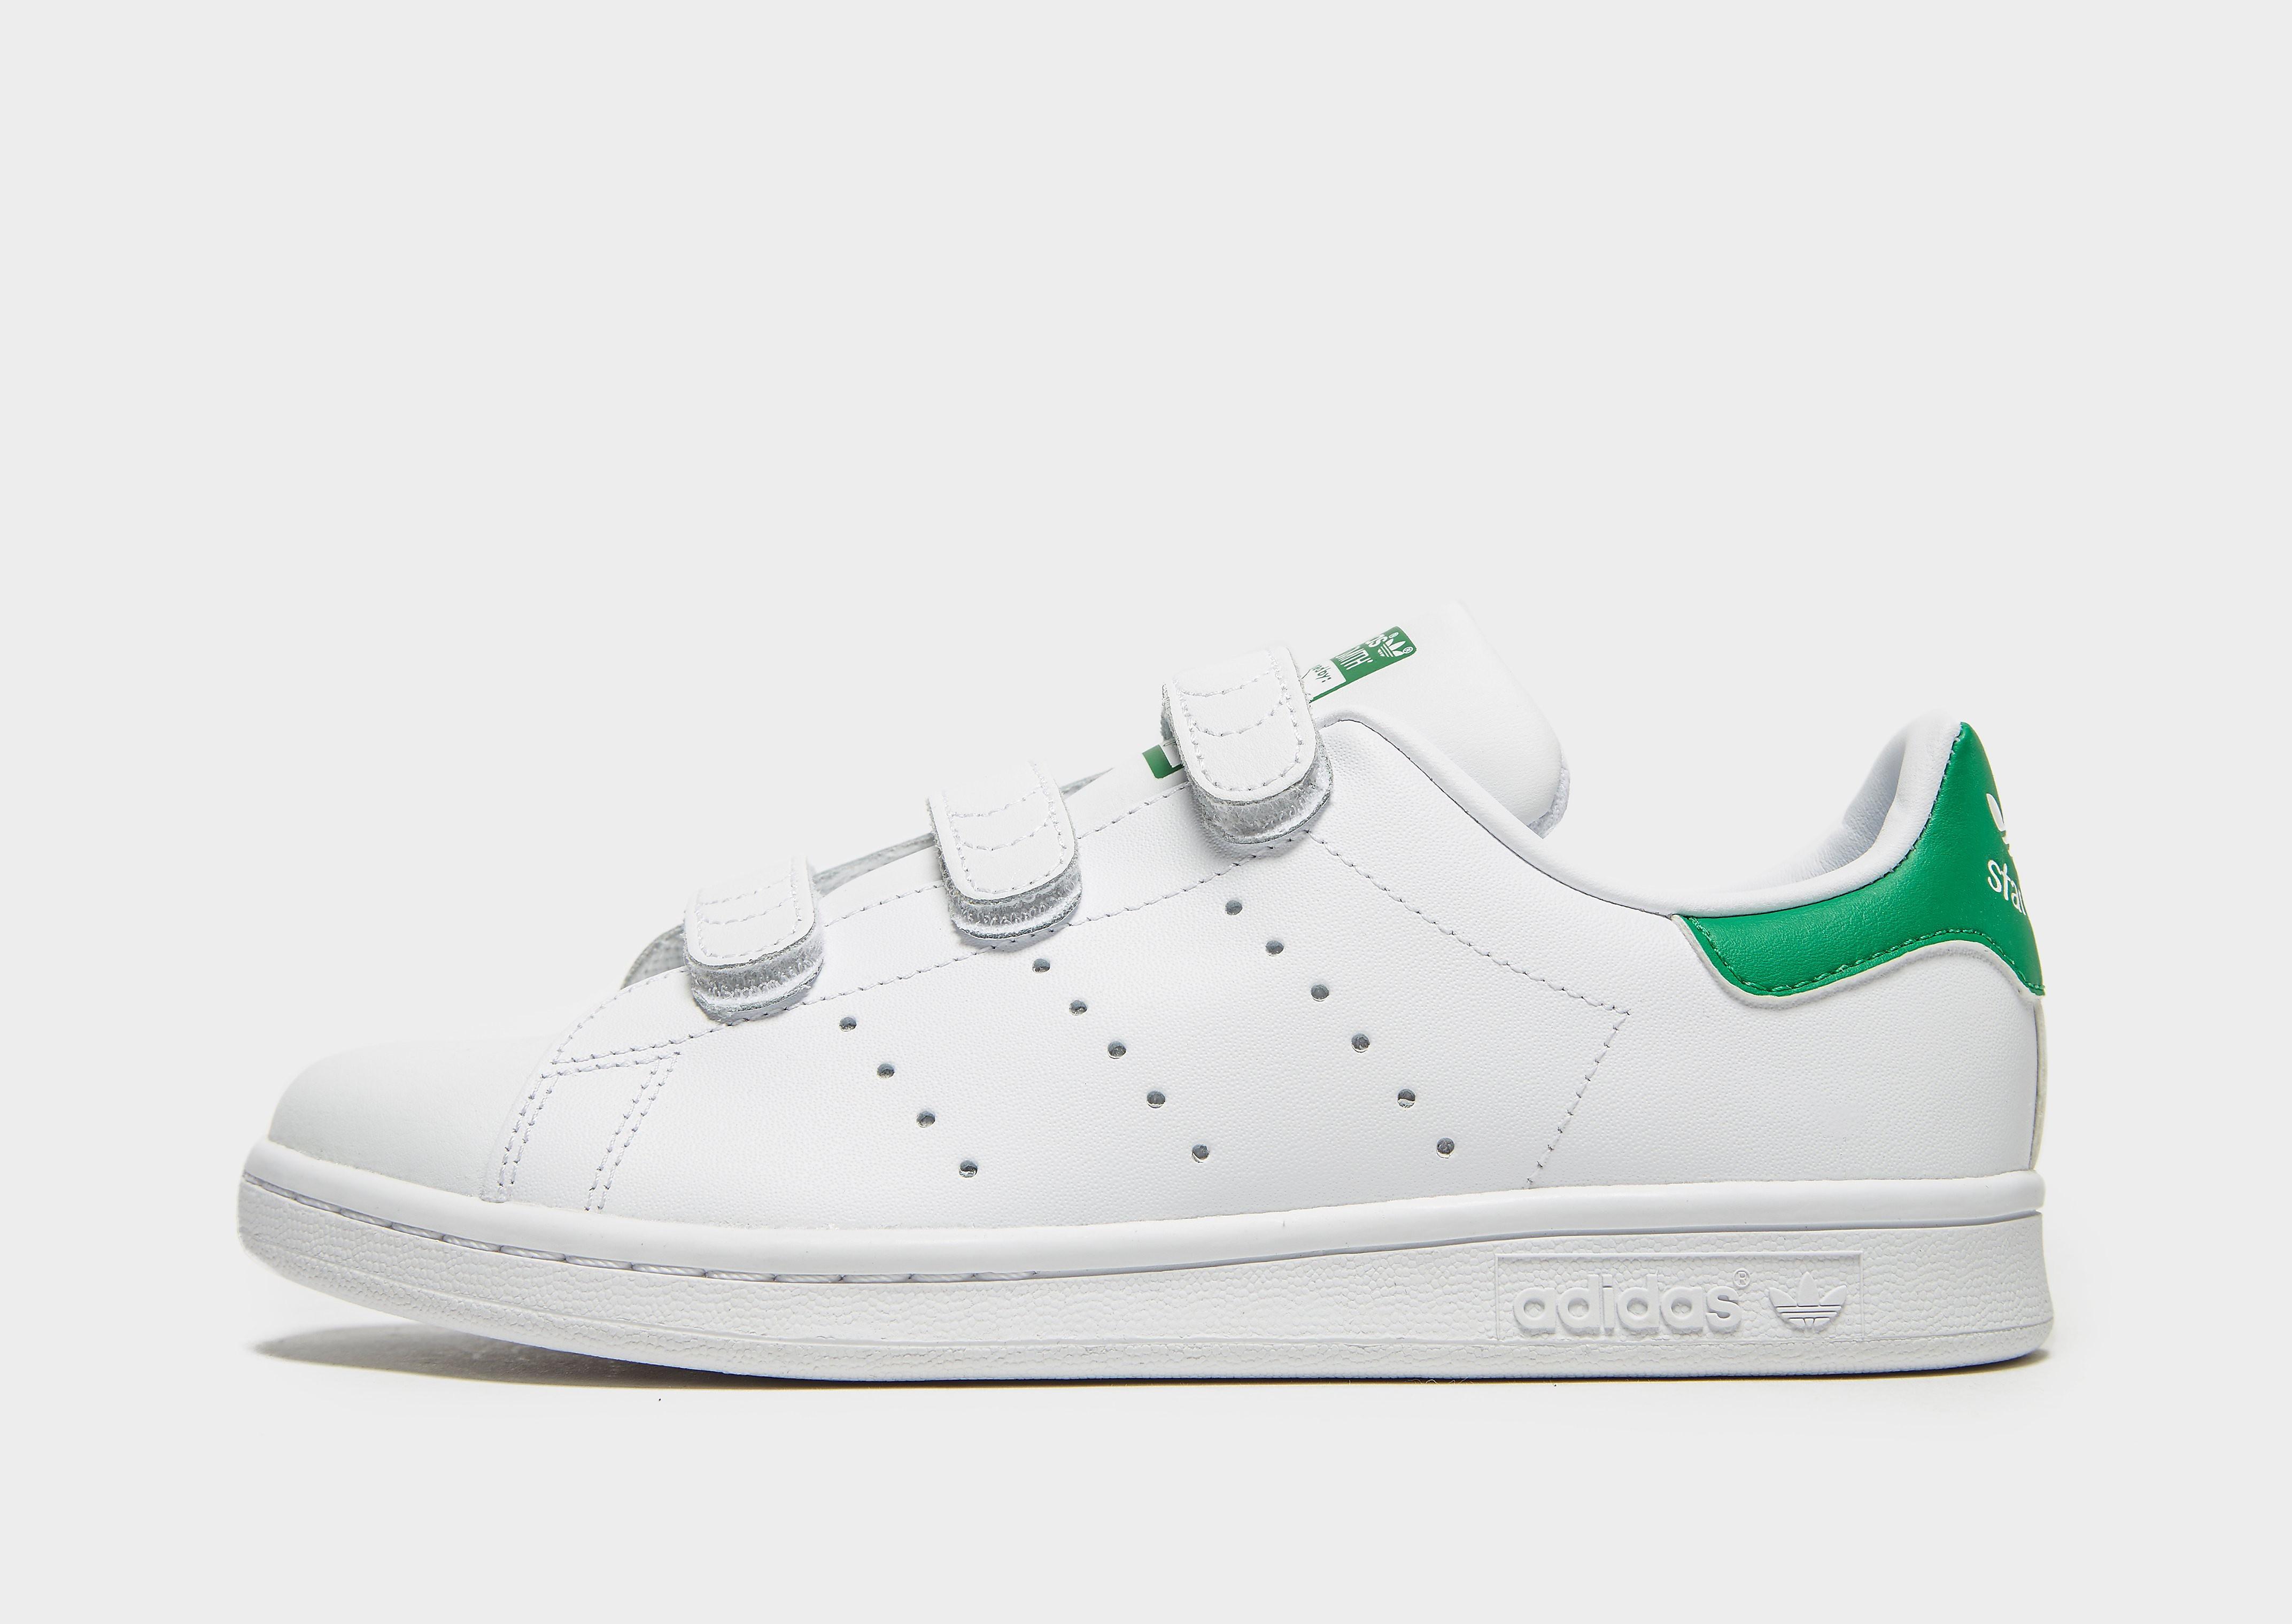 Adidas Stan Smith kindersneaker wit en groen